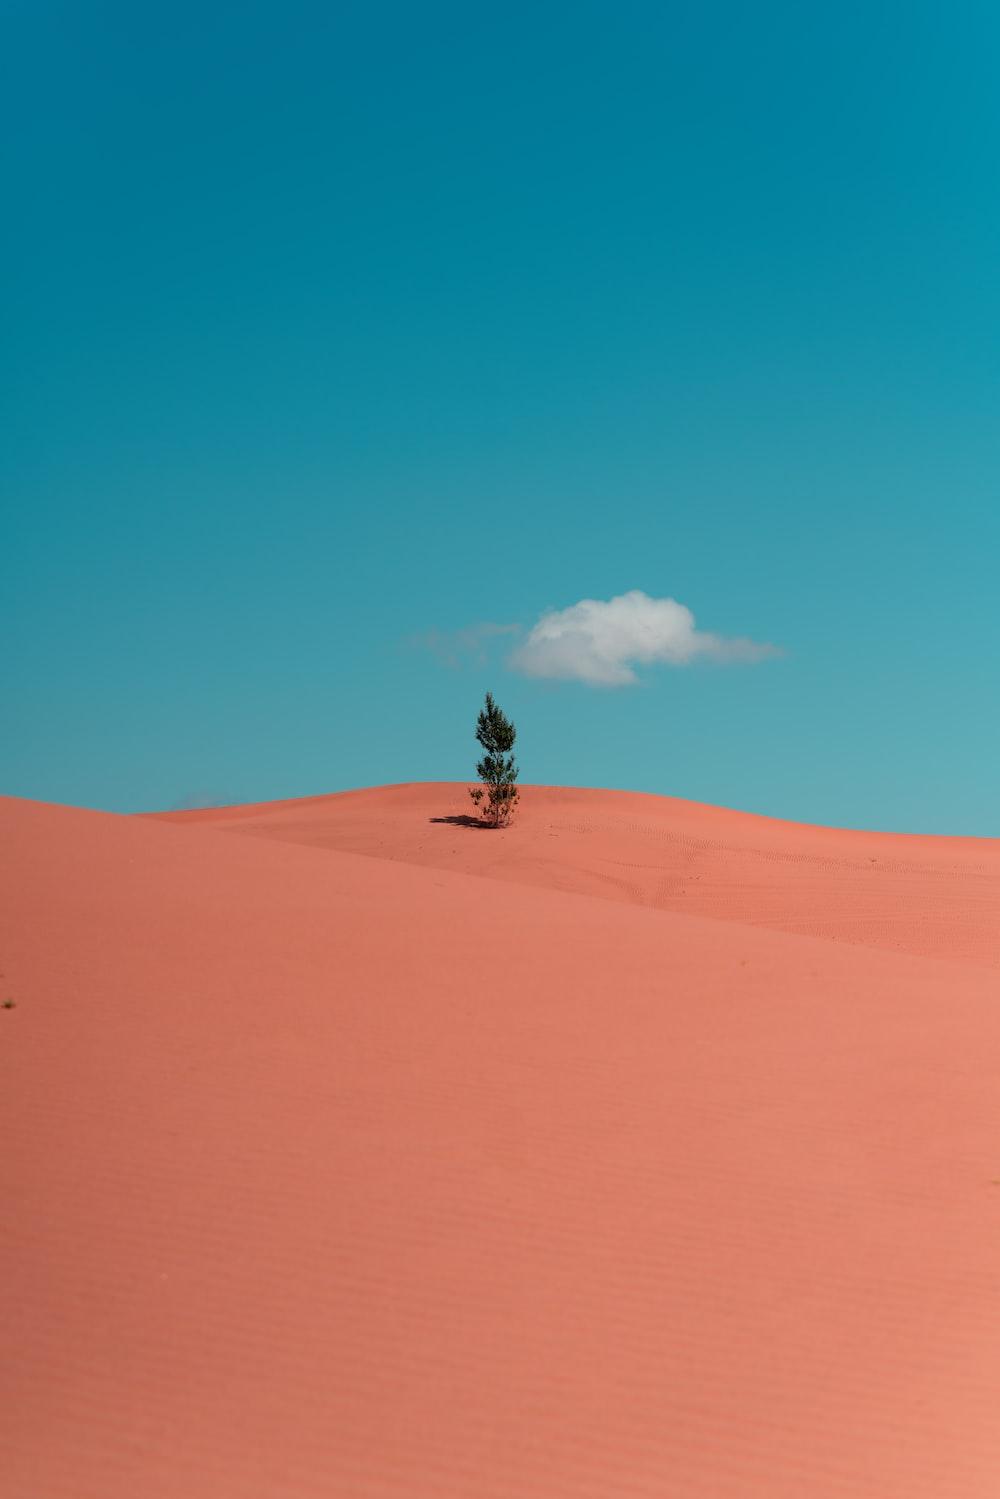 man in black jacket sitting on brown sand under blue sky during daytime